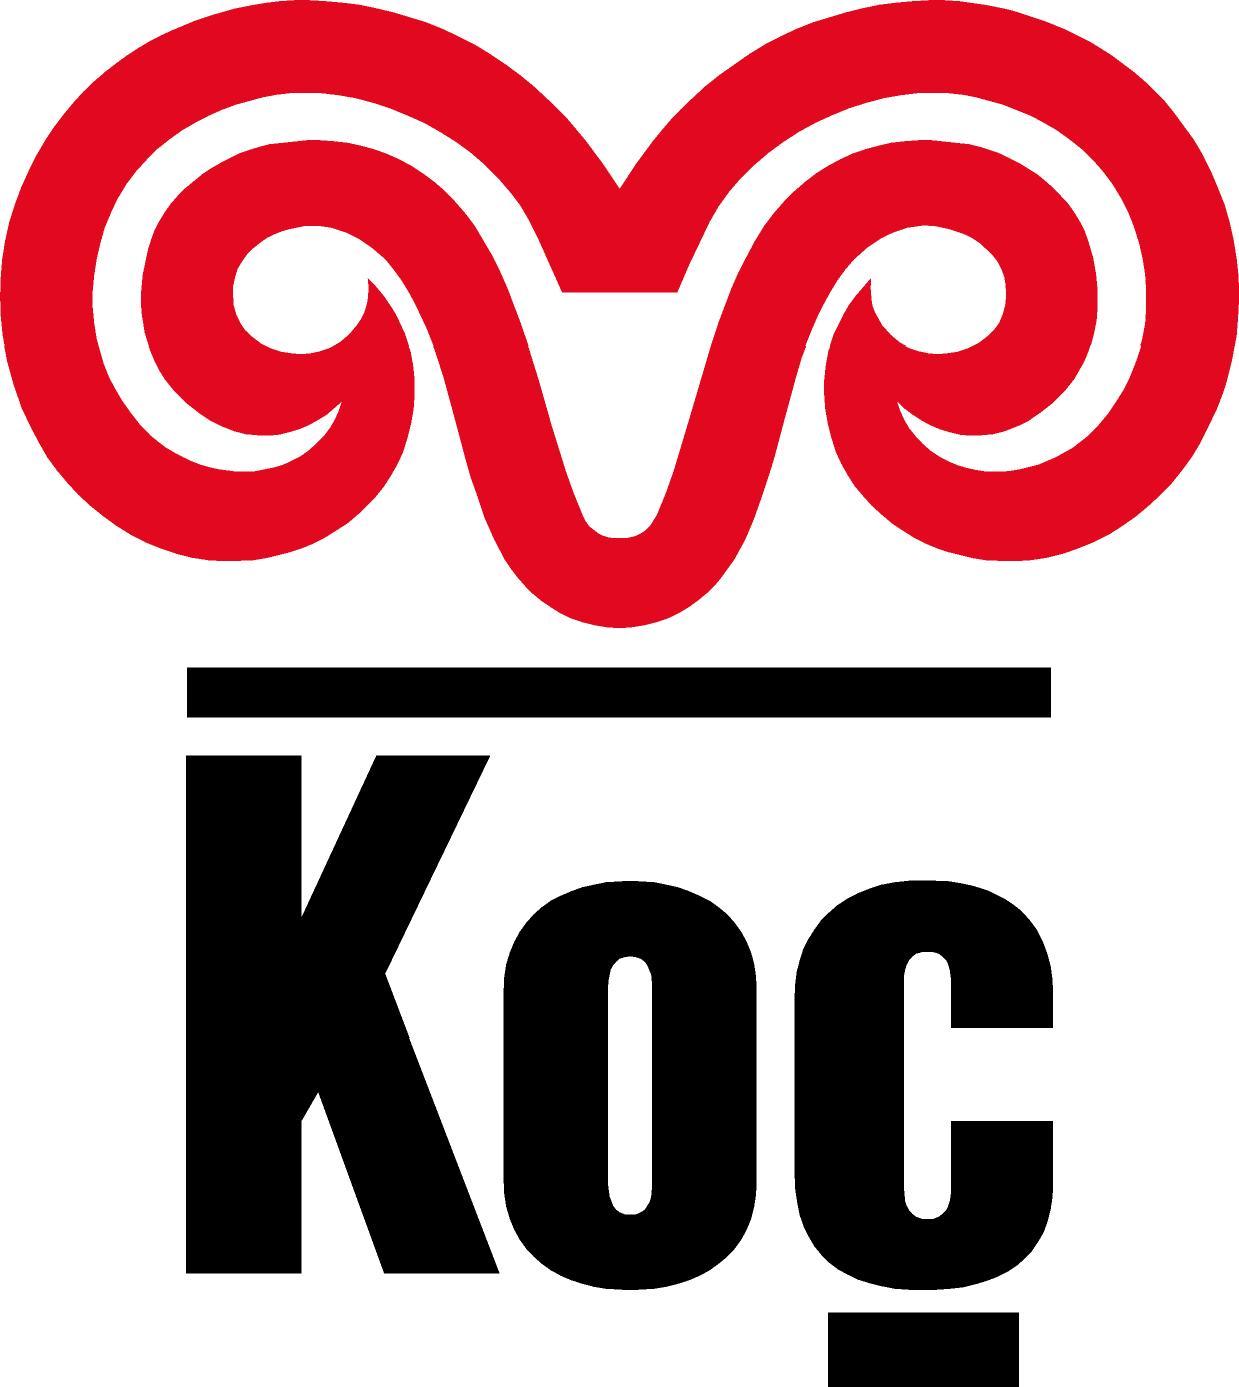 koc_holding_logo_amblem